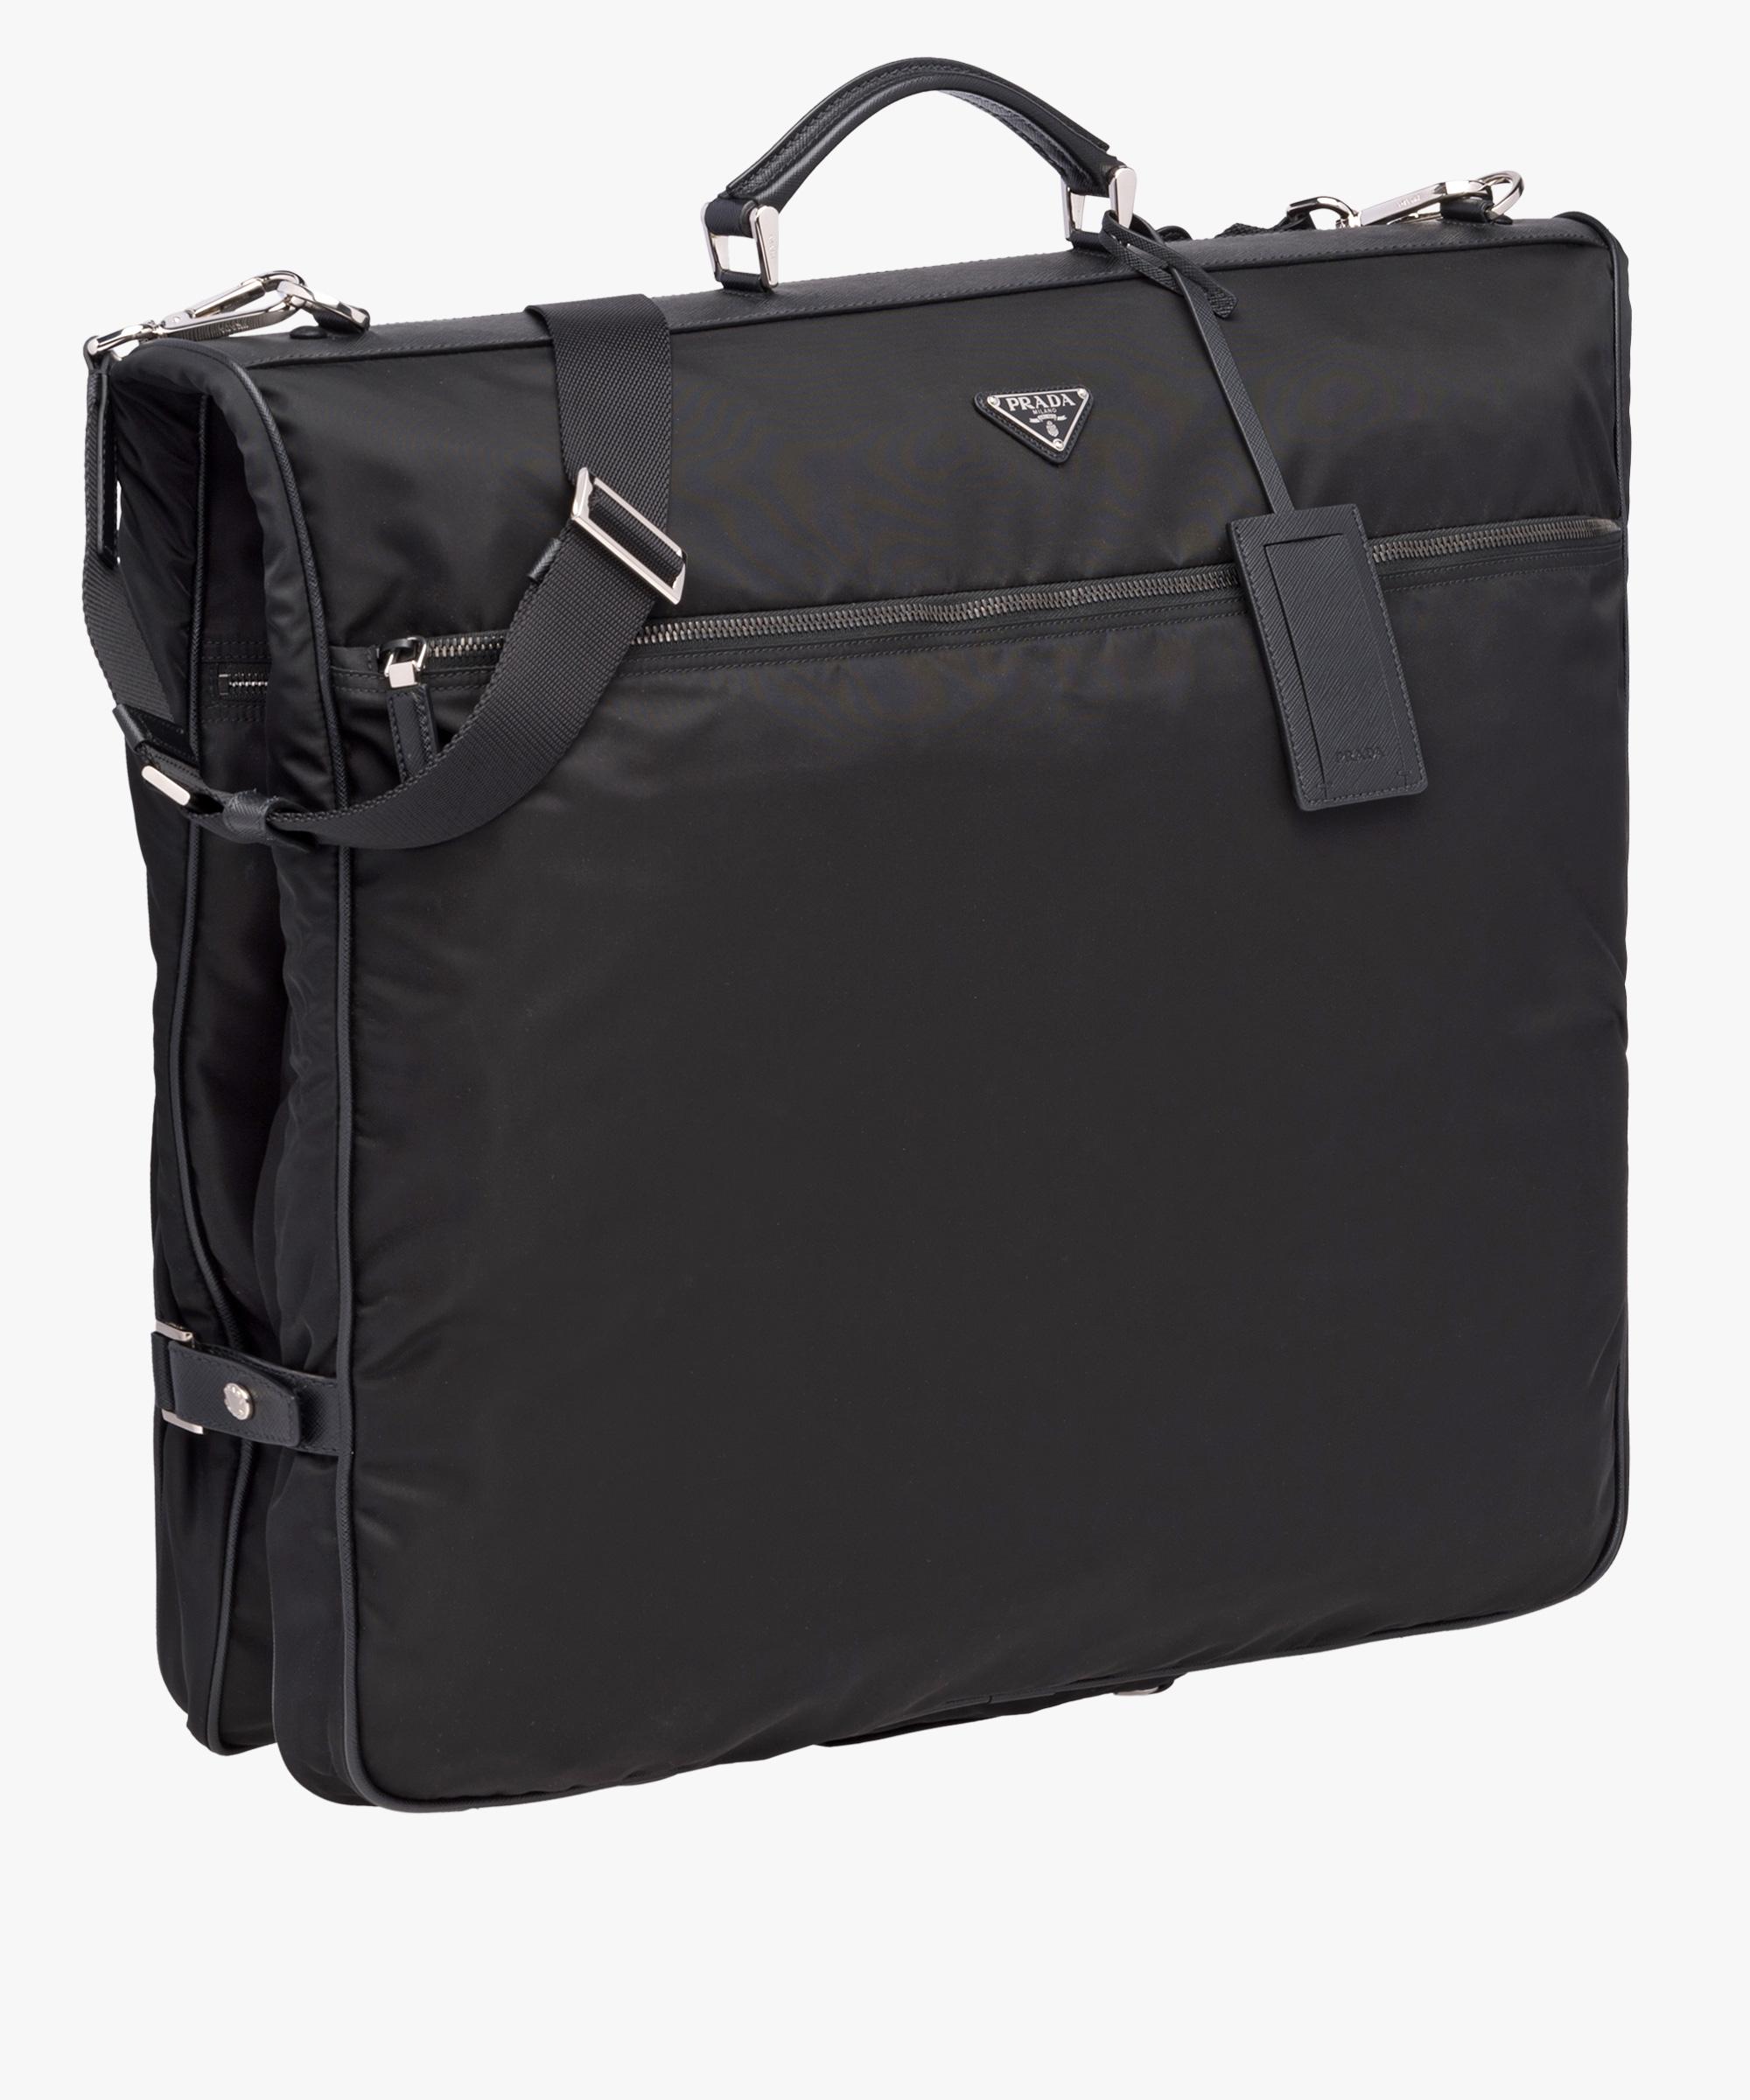 da7ff892109bcd ... Saffiano leather and nylon garment bag Prada BLACK ...